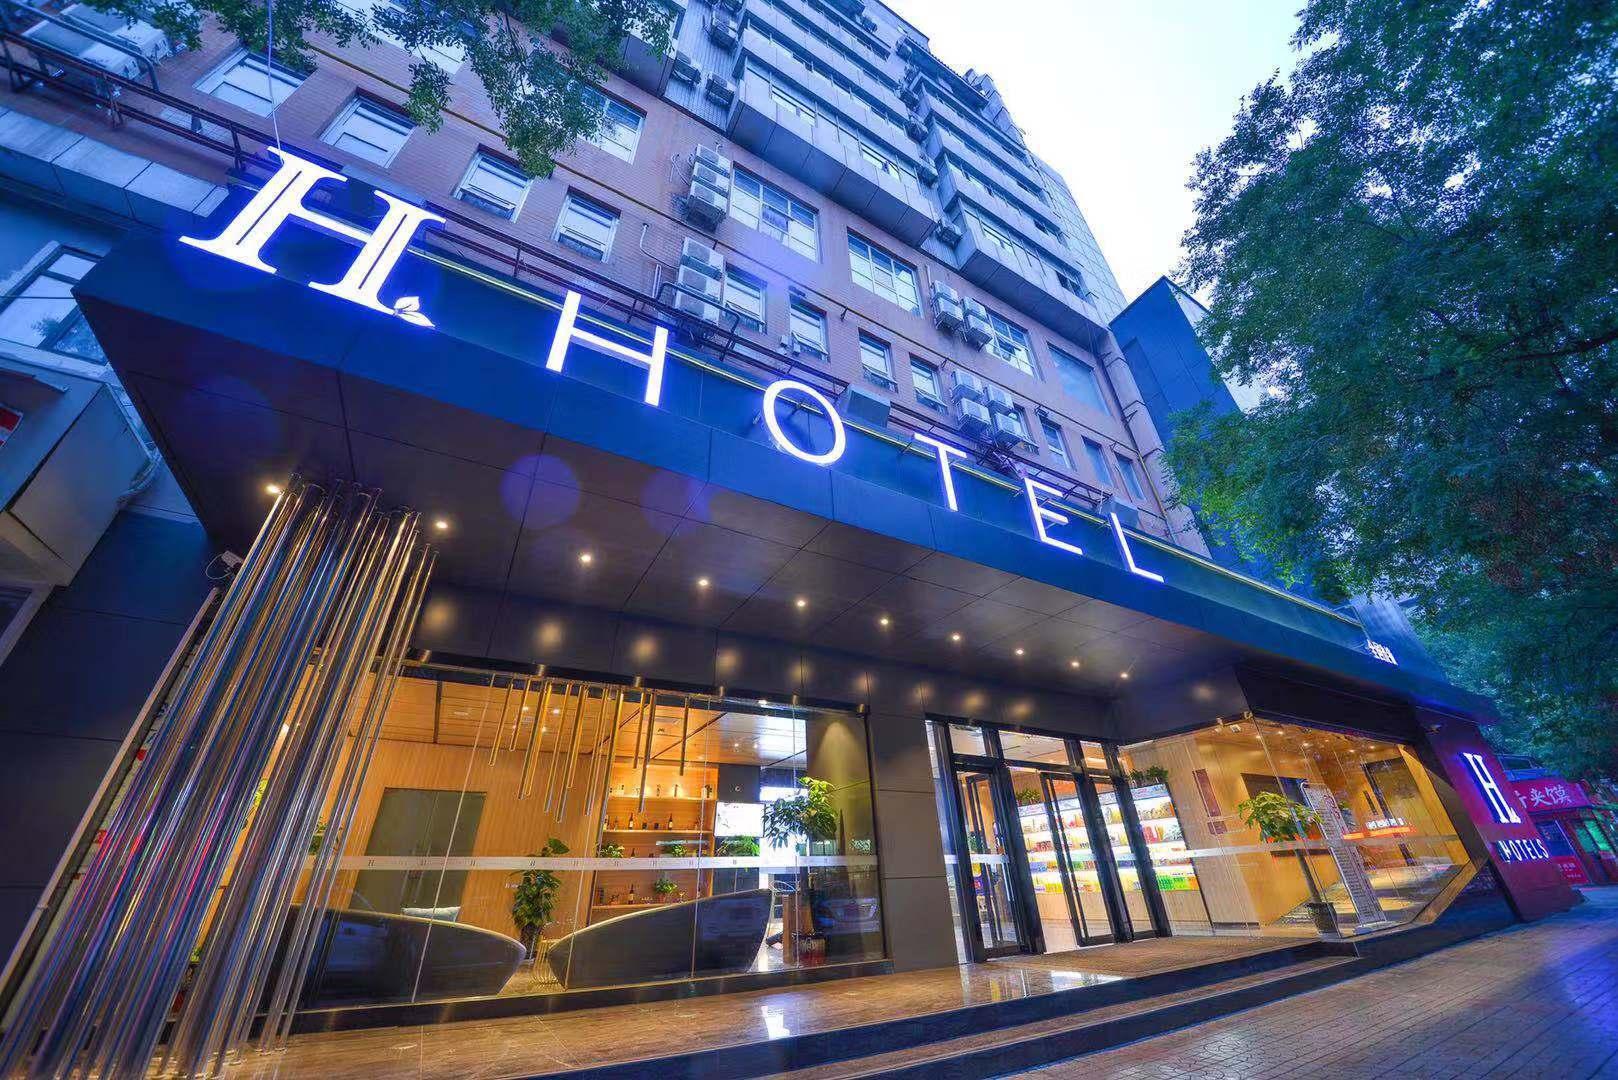 H酒店(西安火车站五路口机场大巴店)内景舒适大床房